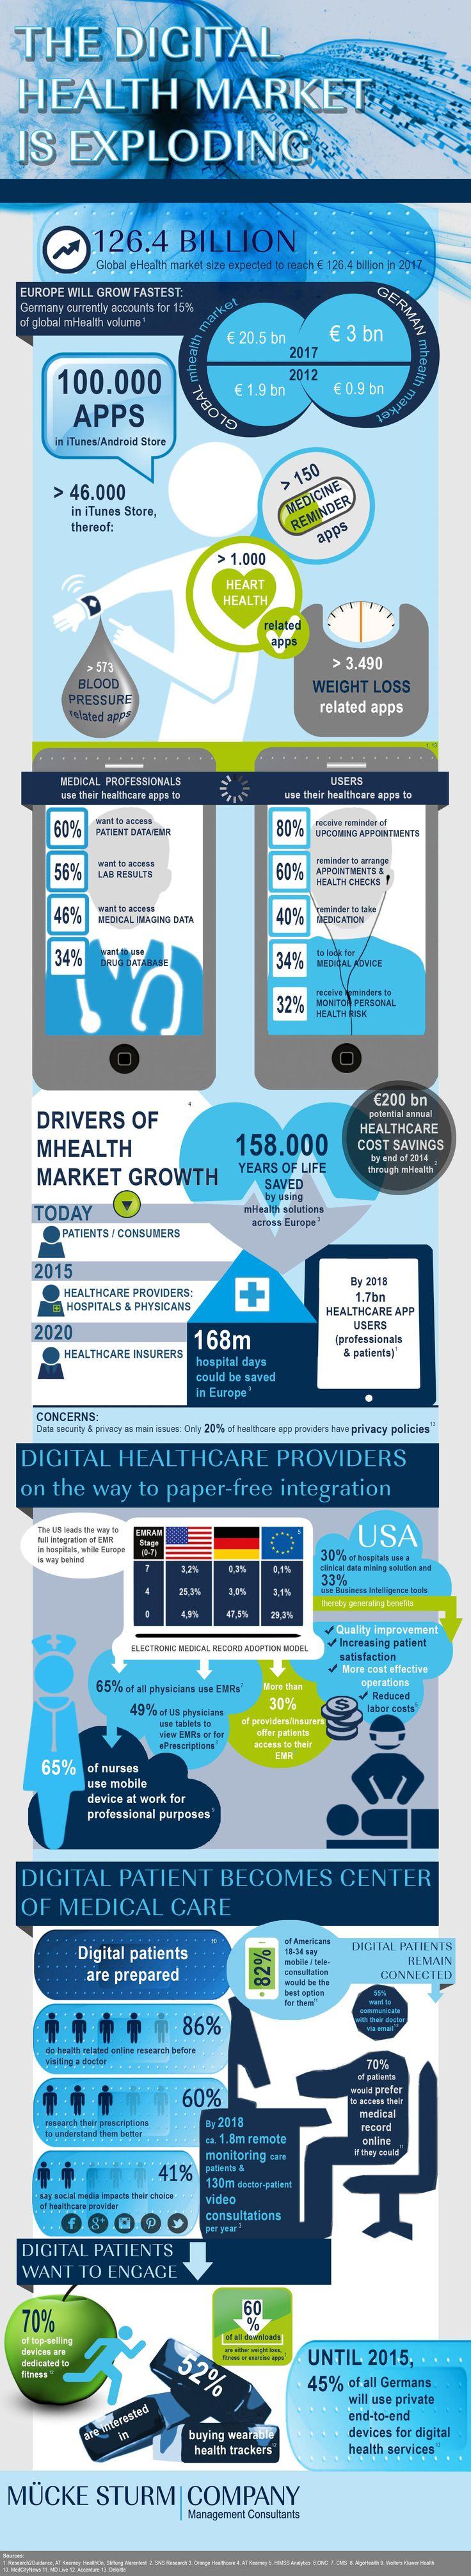 Die Bedeutung des Digital Health Marktes